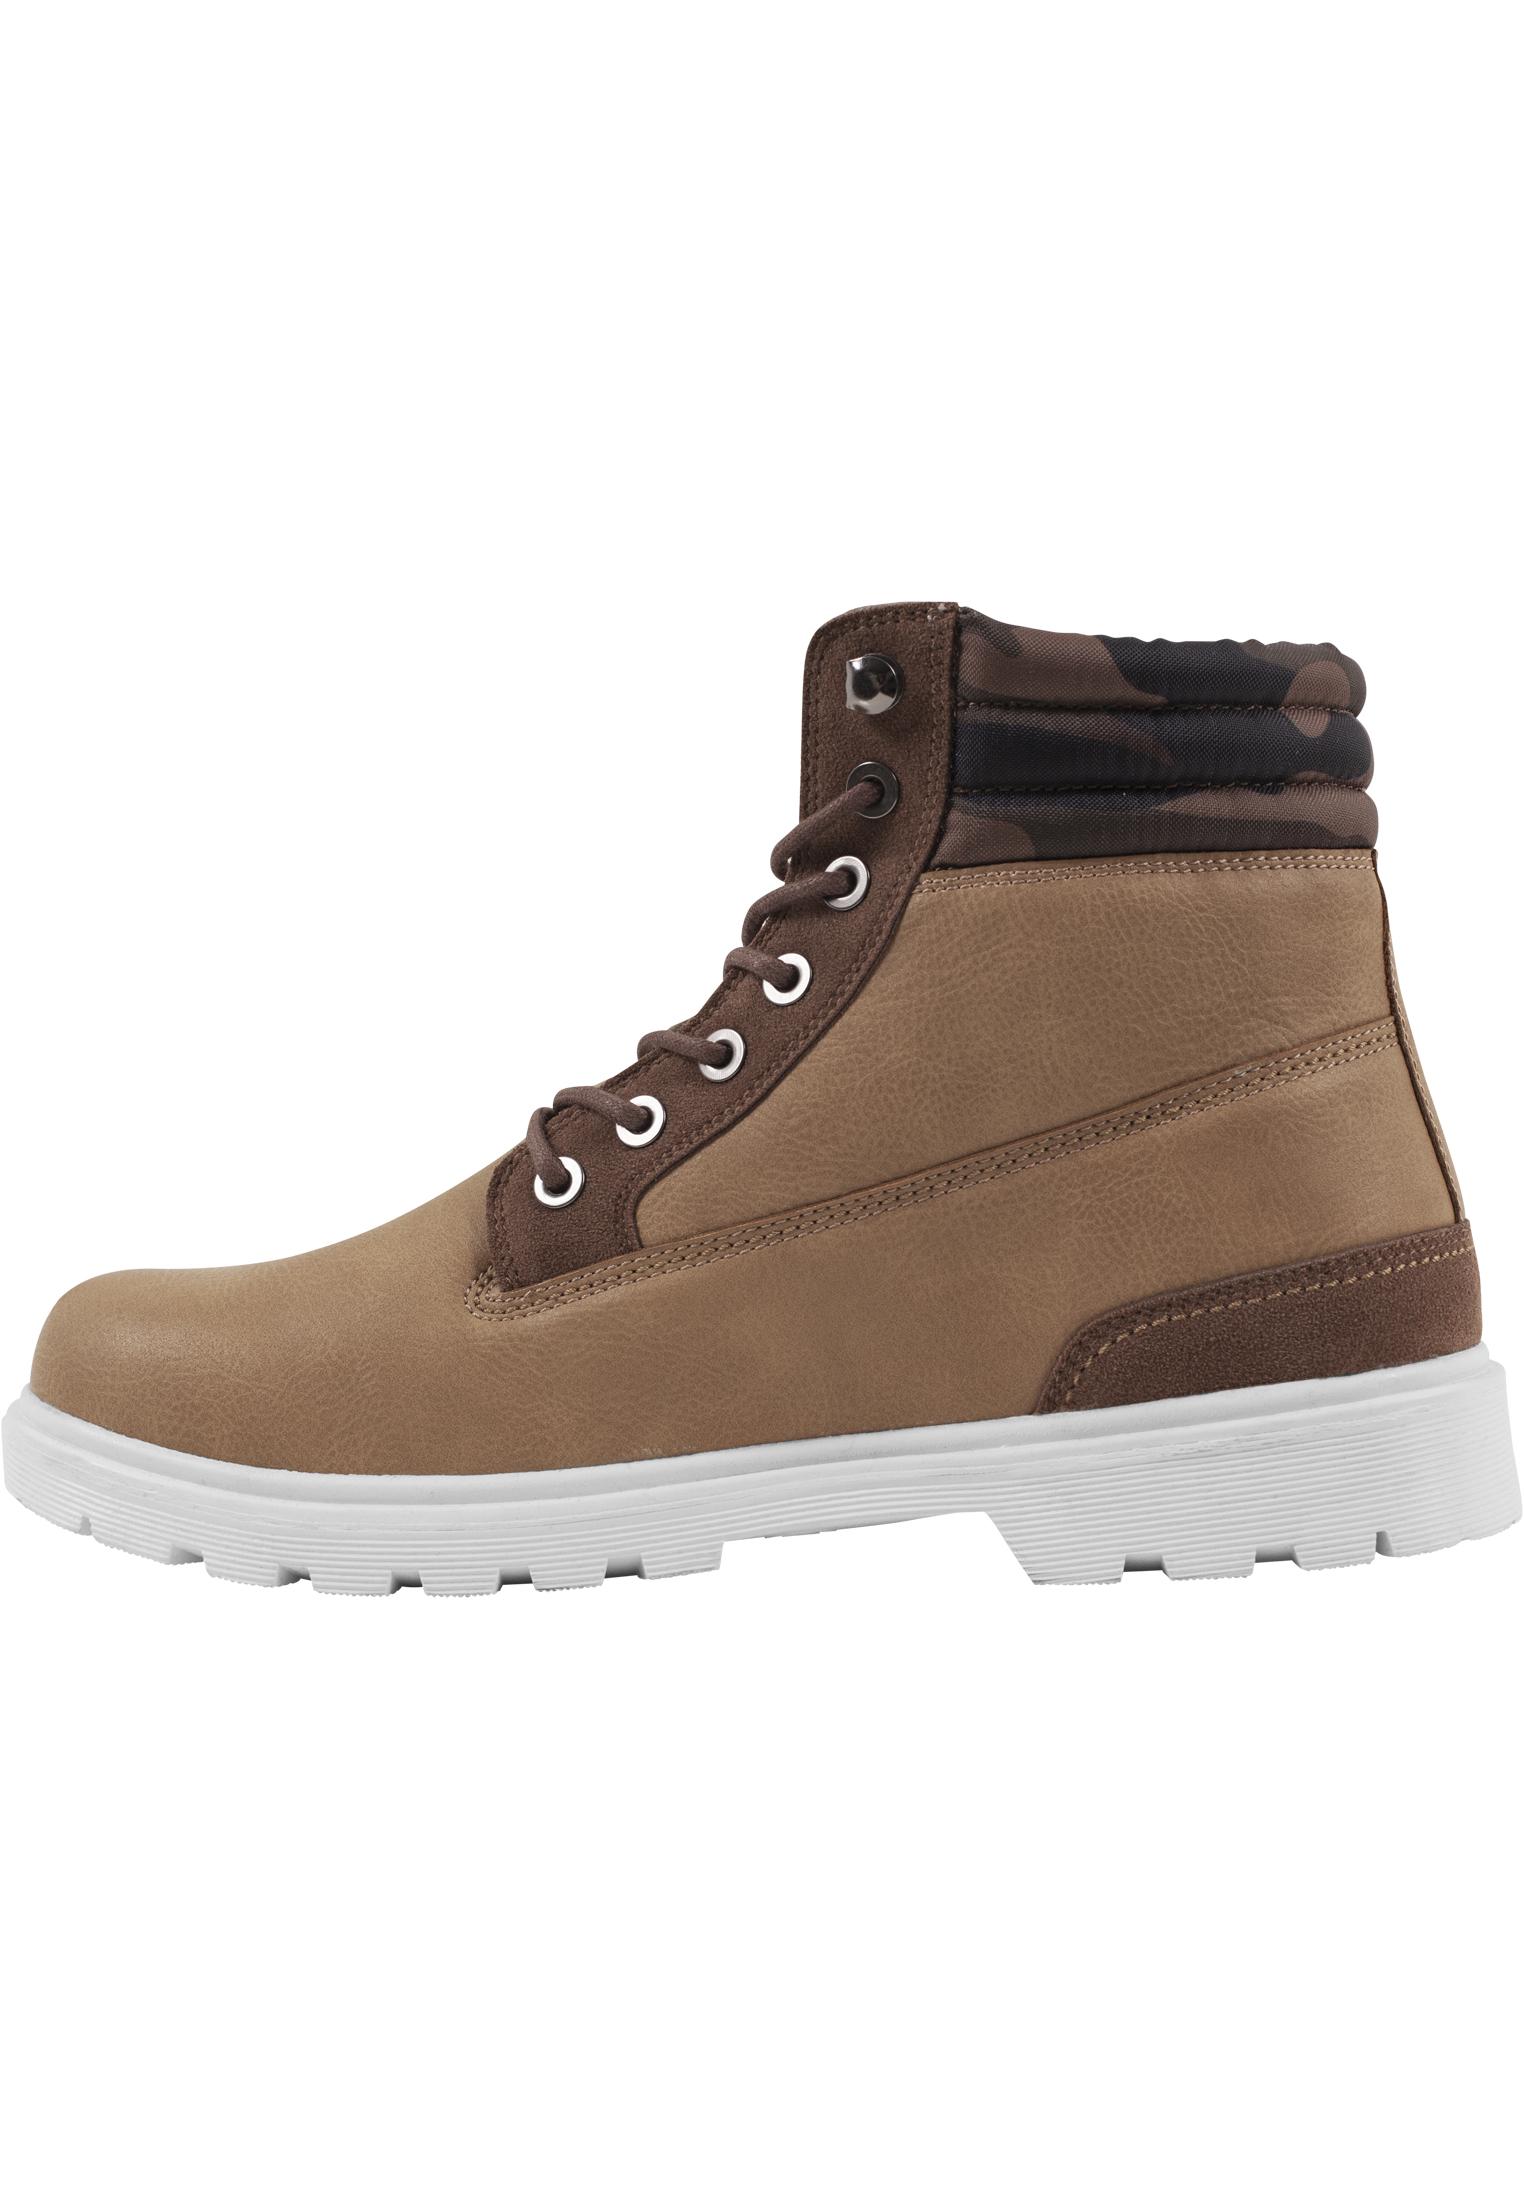 3071369d86d5 Winter Boots Winter Boots Winter Boots ...